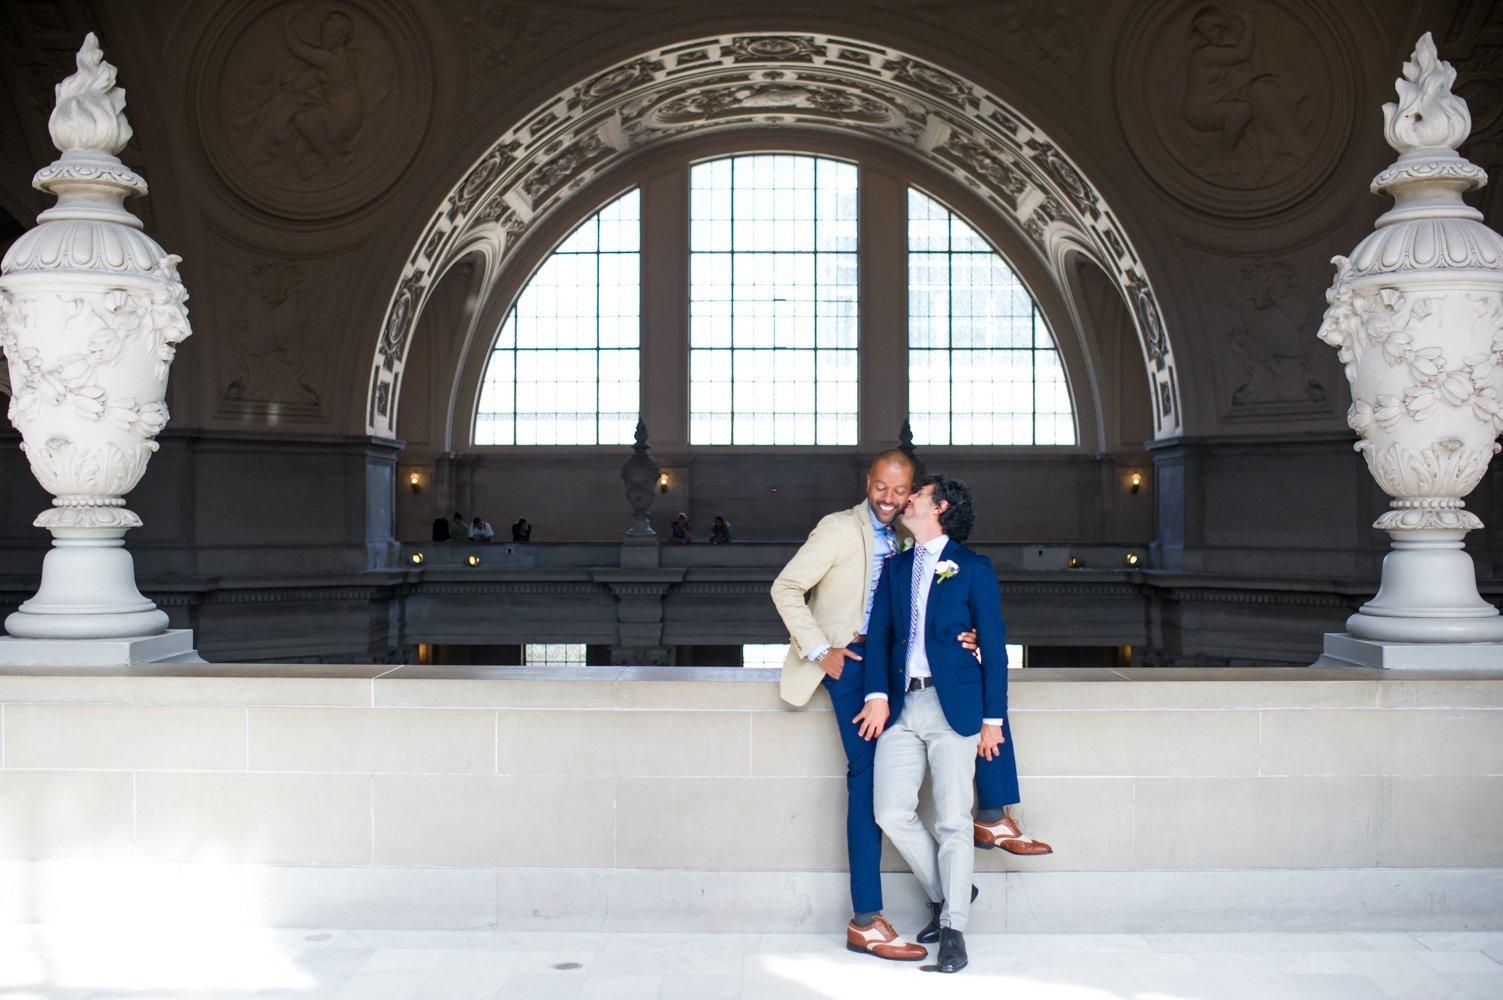 A Lovely Day for a San Francisco City Hall Wedding | Collin & Brian